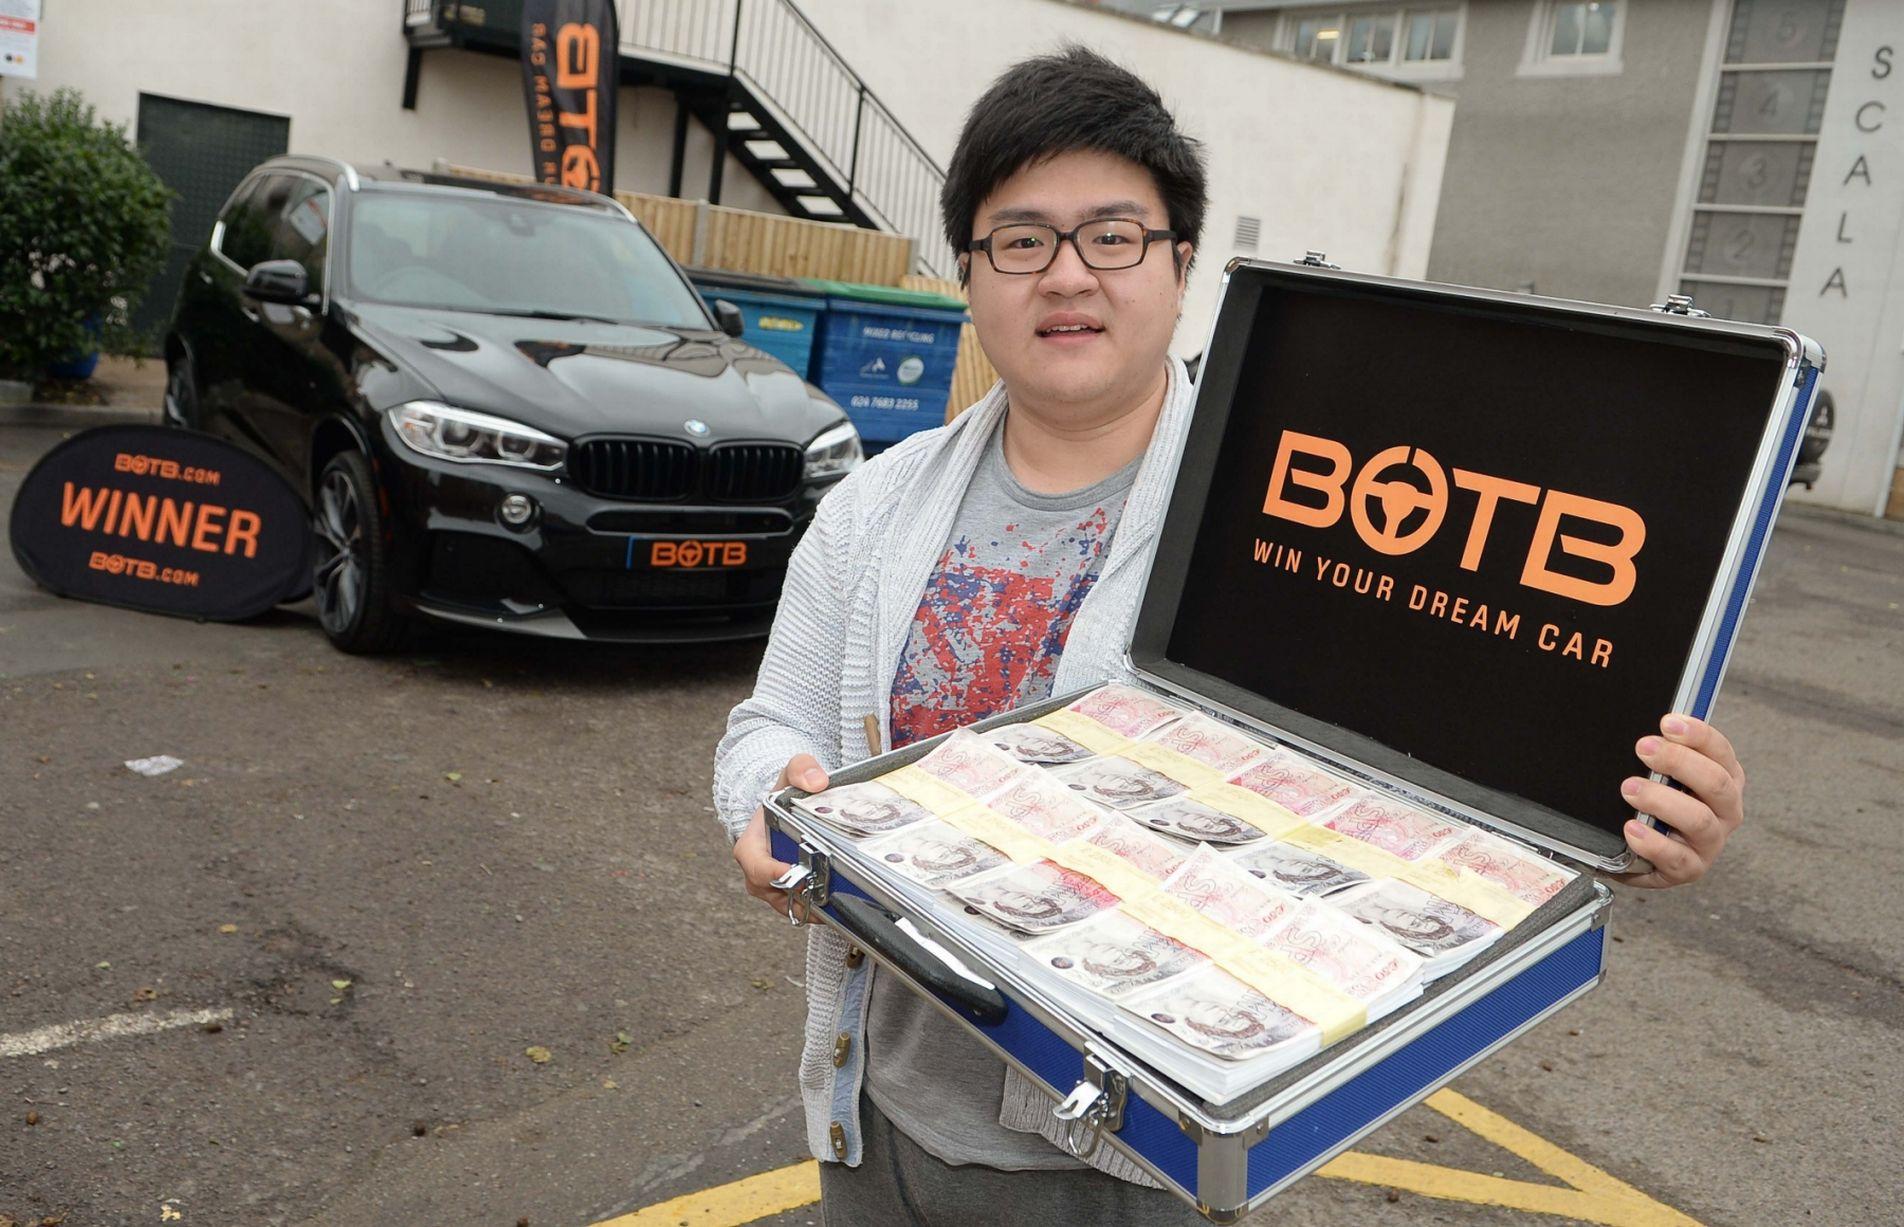 """It's like a dream"": Hengqin and his winnings"